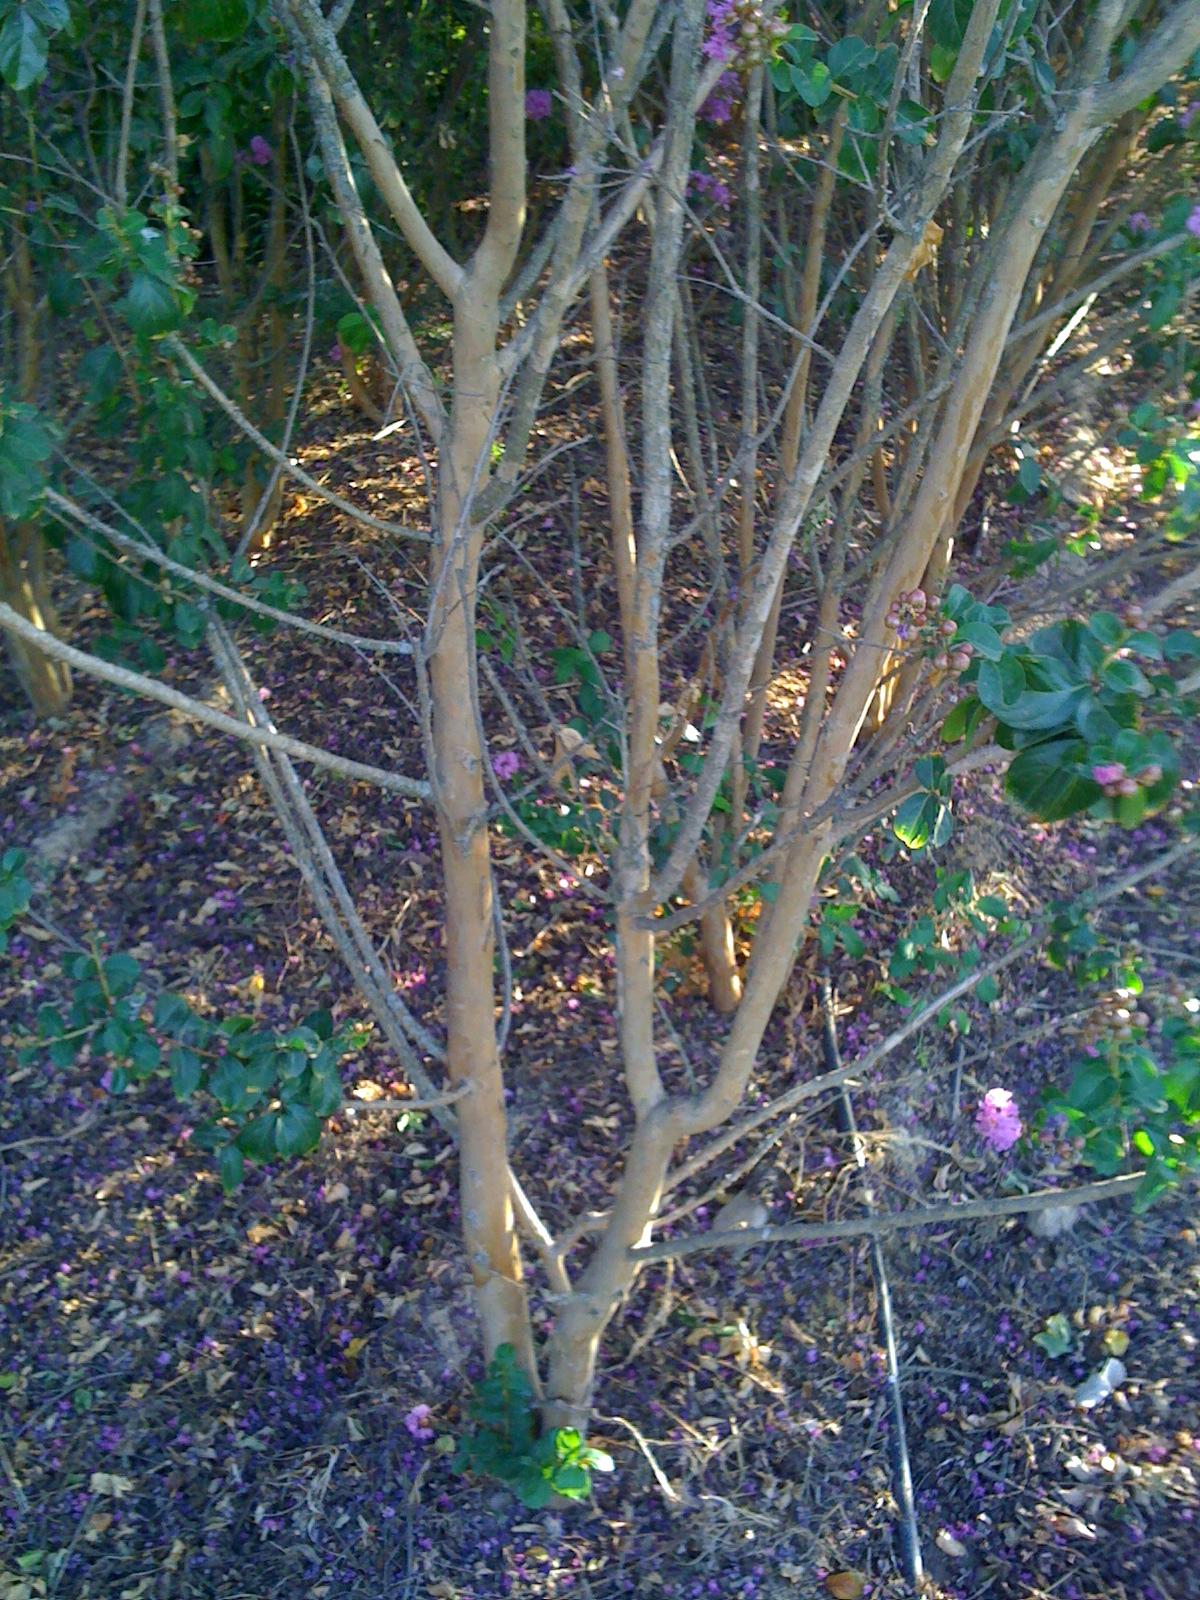 Vivero arboles ornamentales lagerstroemia indica maceta y for Viveros arboles ornamentales